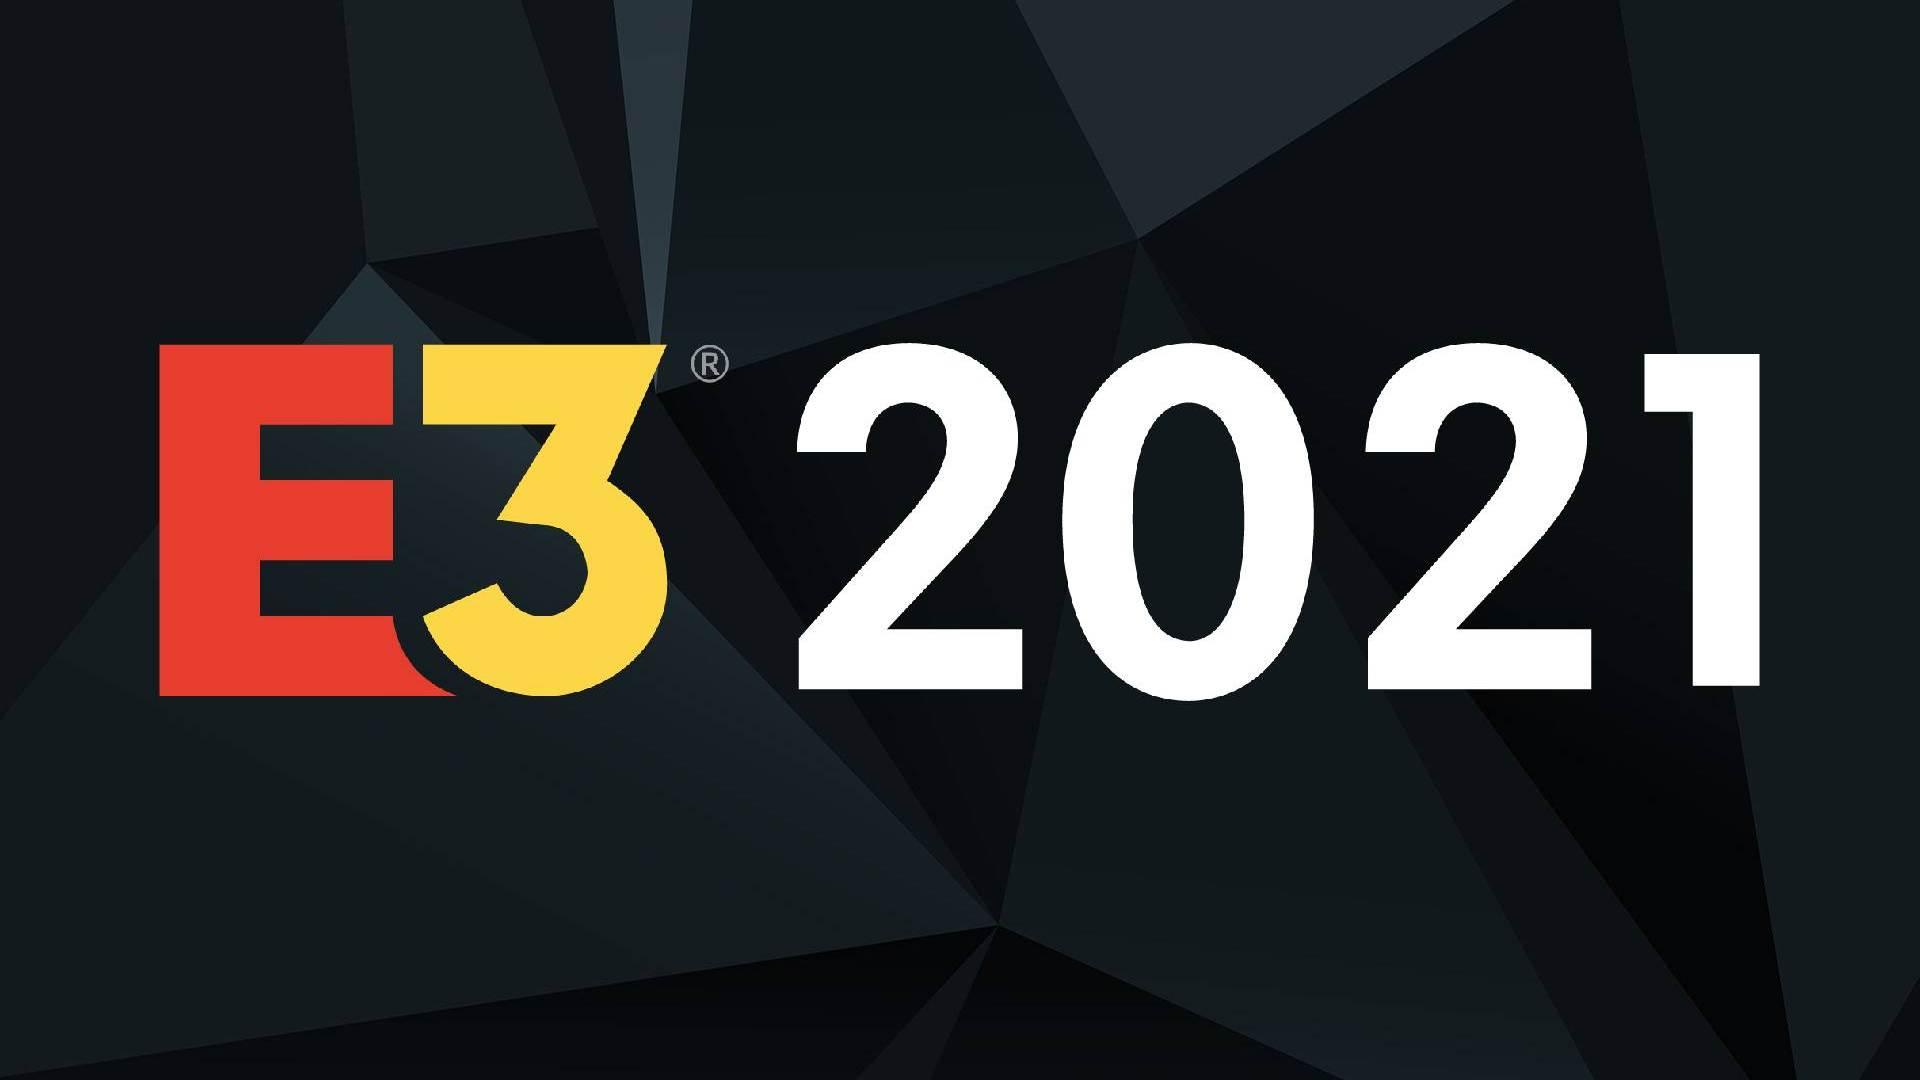 Square Enix, Bandai Namco, Sega, and more are joining the E3 2021 lineup screenshot